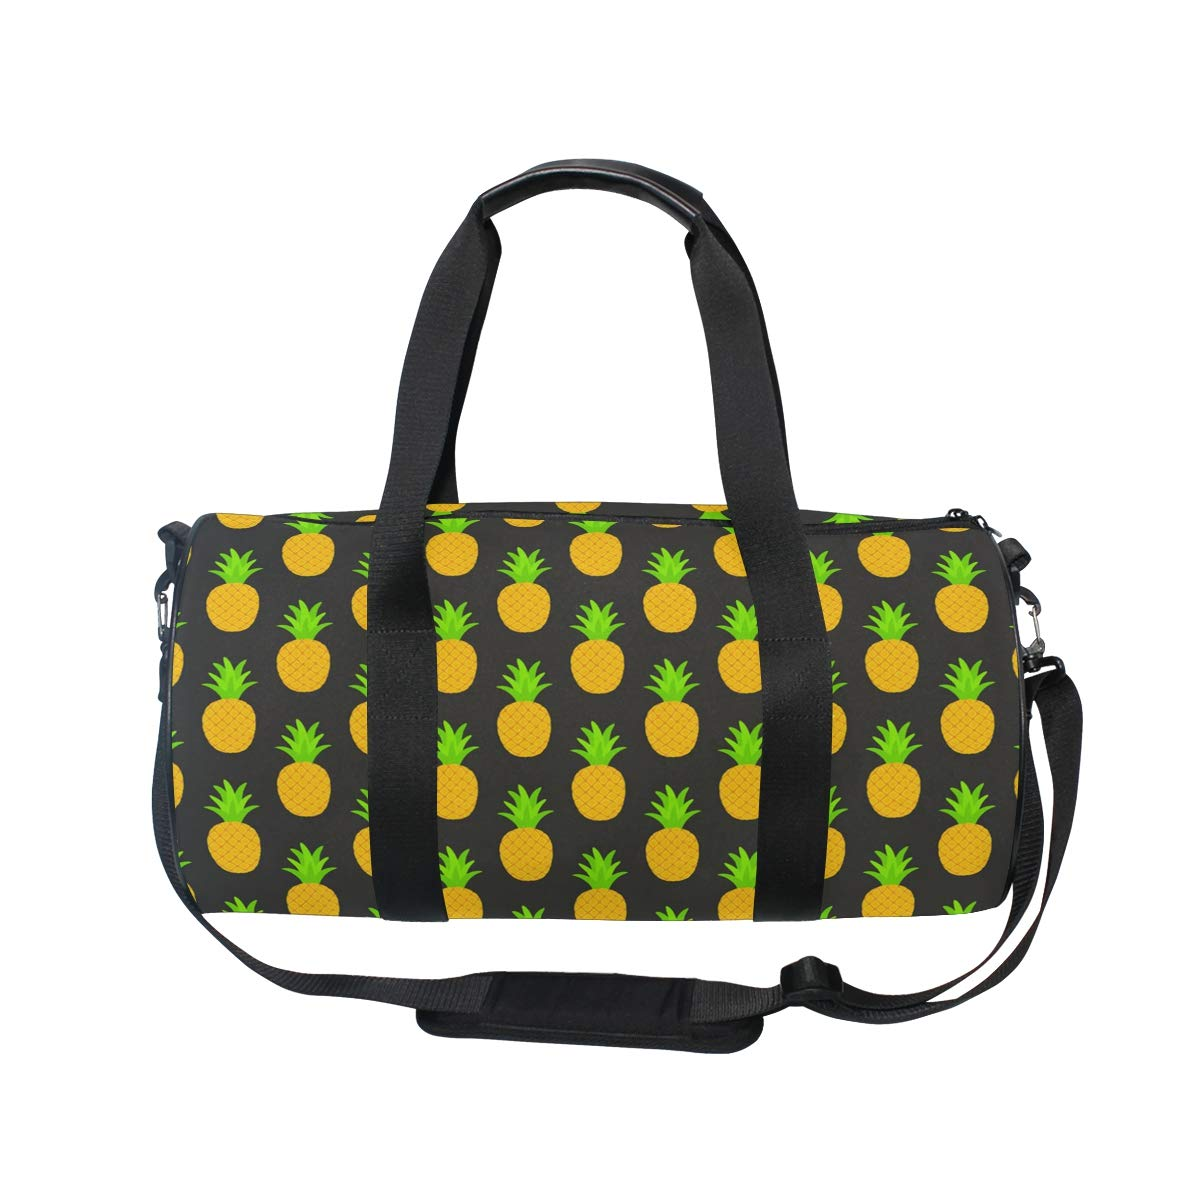 Waterproof Non-Slip Wearable Crossbody Bag fitness bag Shoulder Bag Bale Fruit Picture